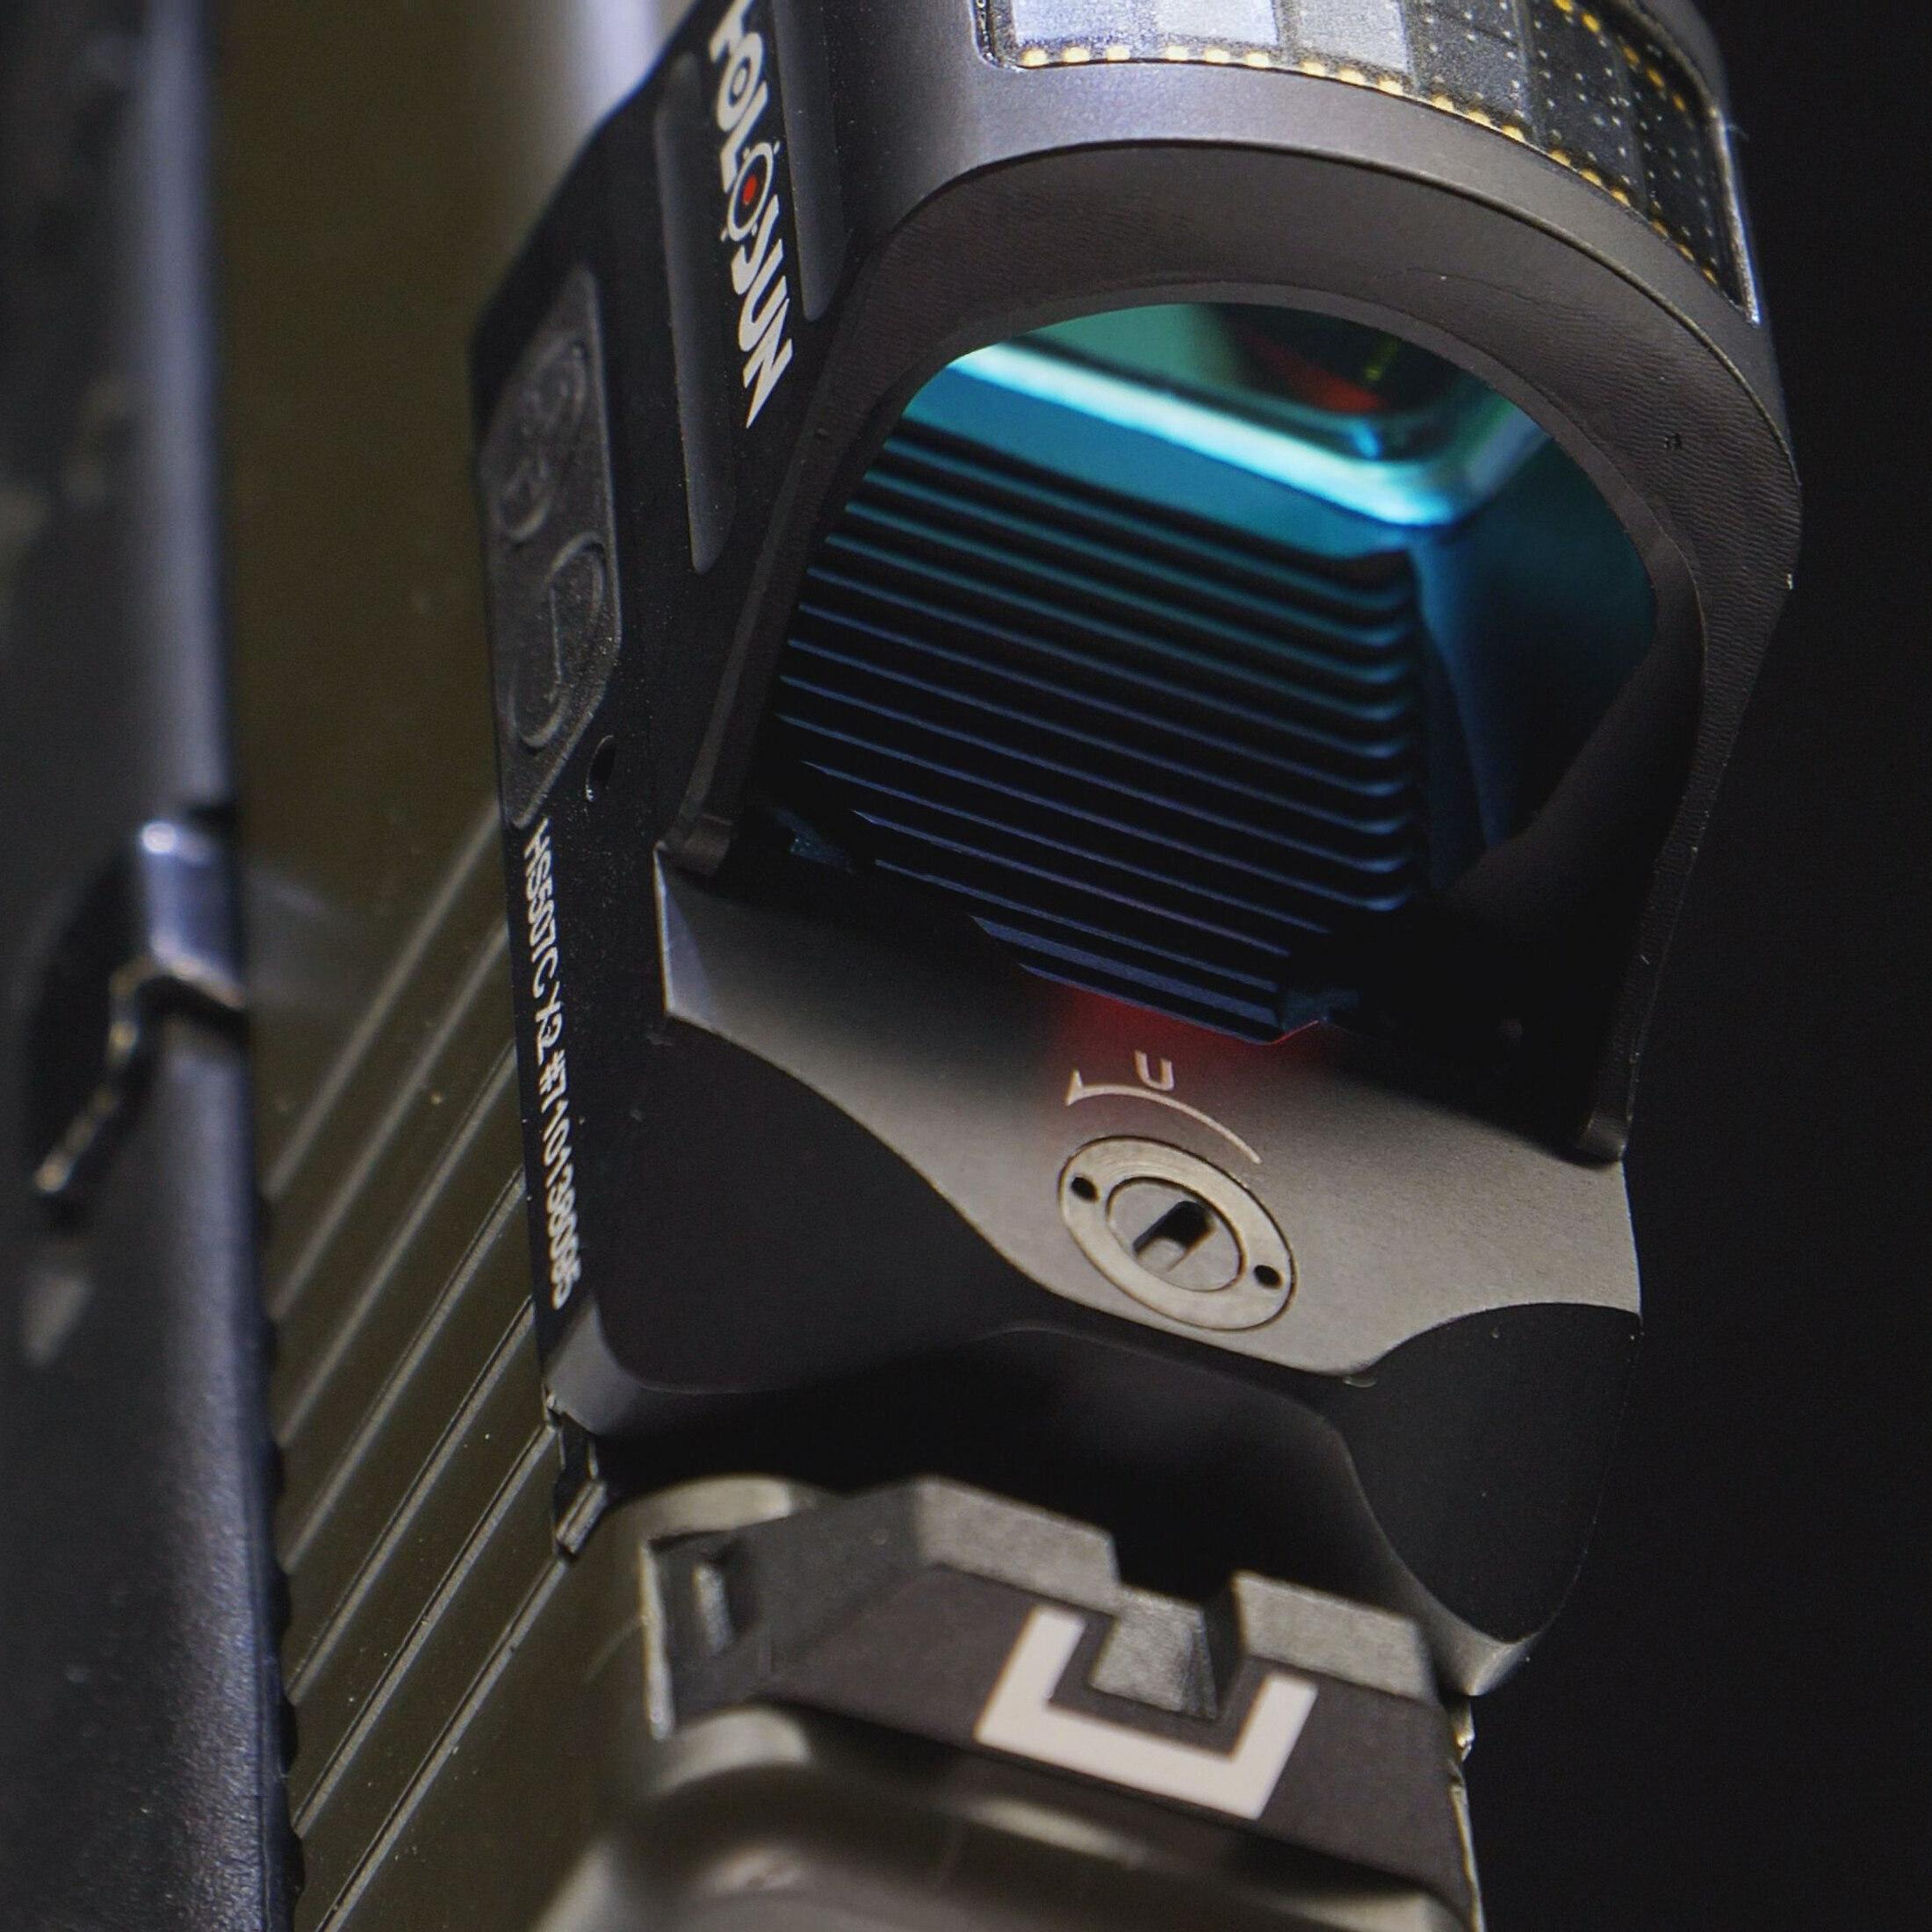 Holosun Dot Sight CLASSIC HS507C-X2-MOUNT